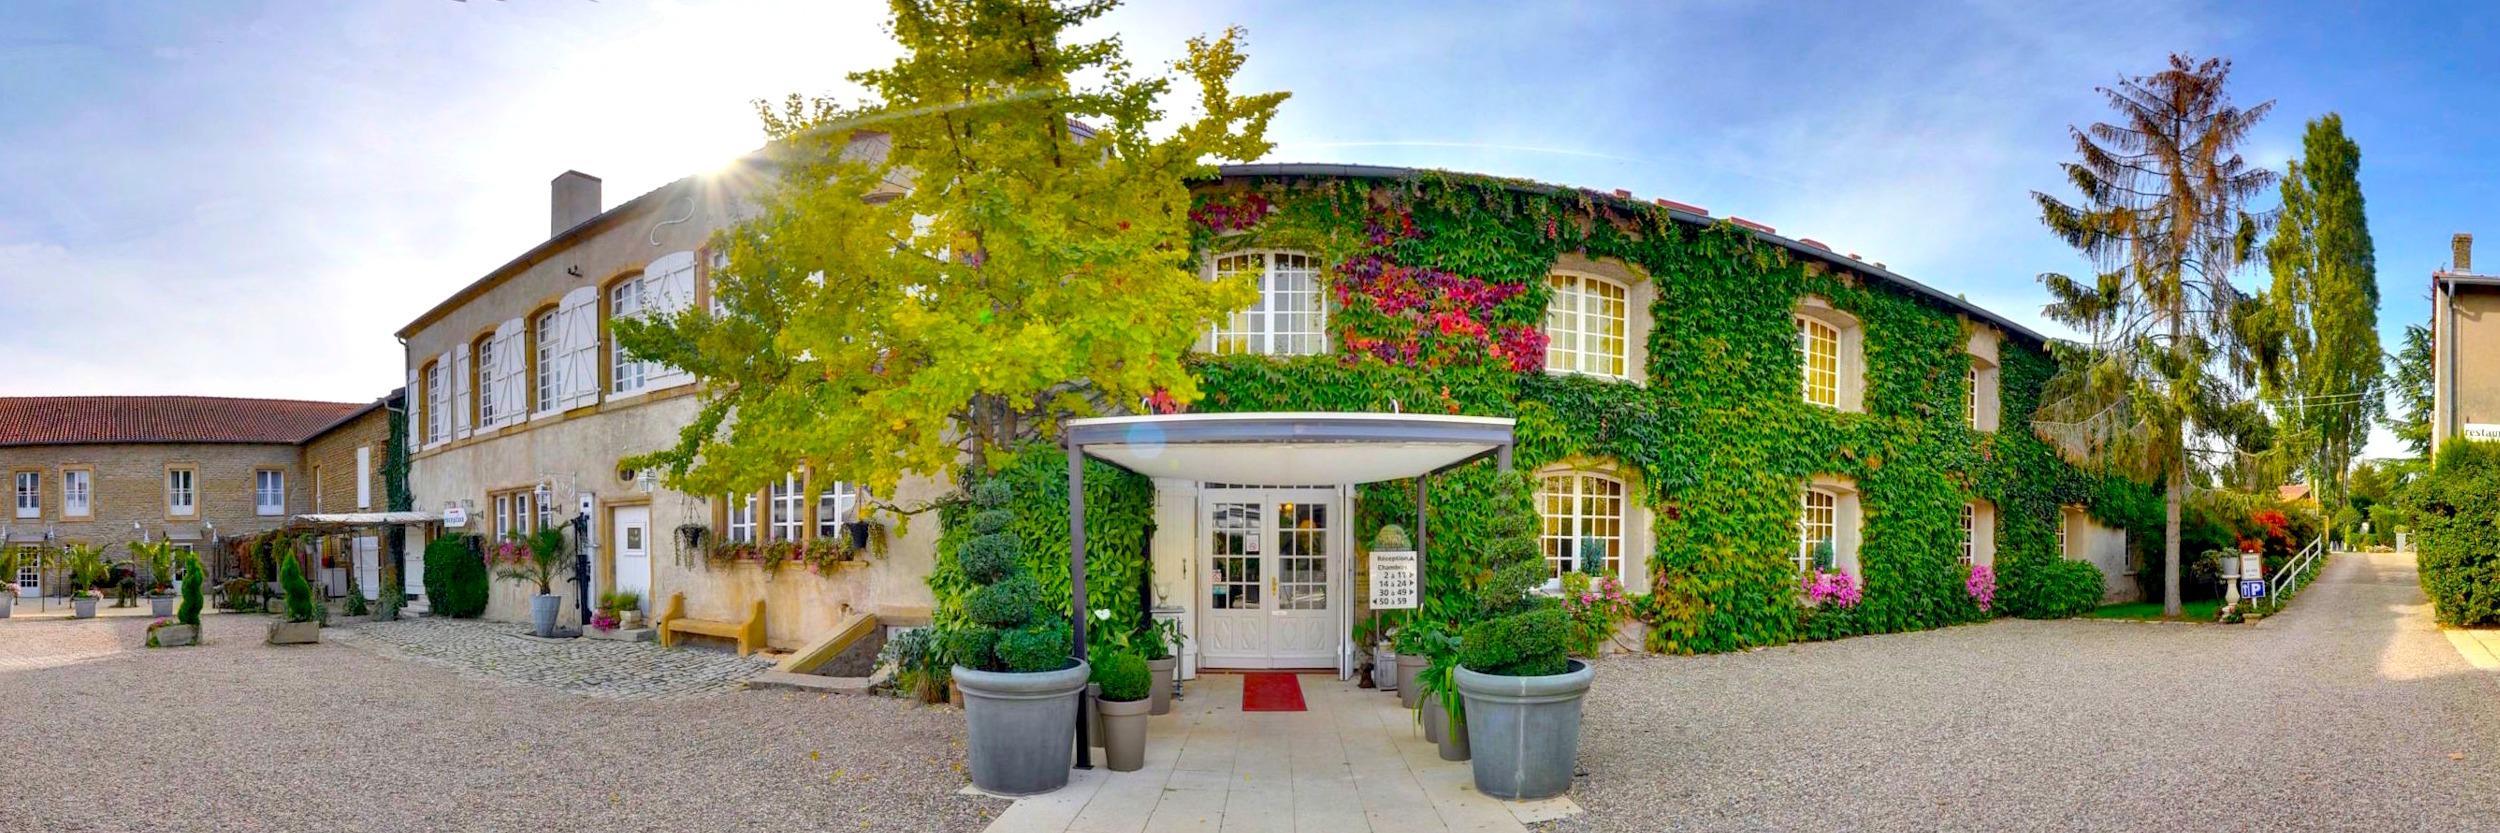 Logis Hotel La Bergerie Catus France